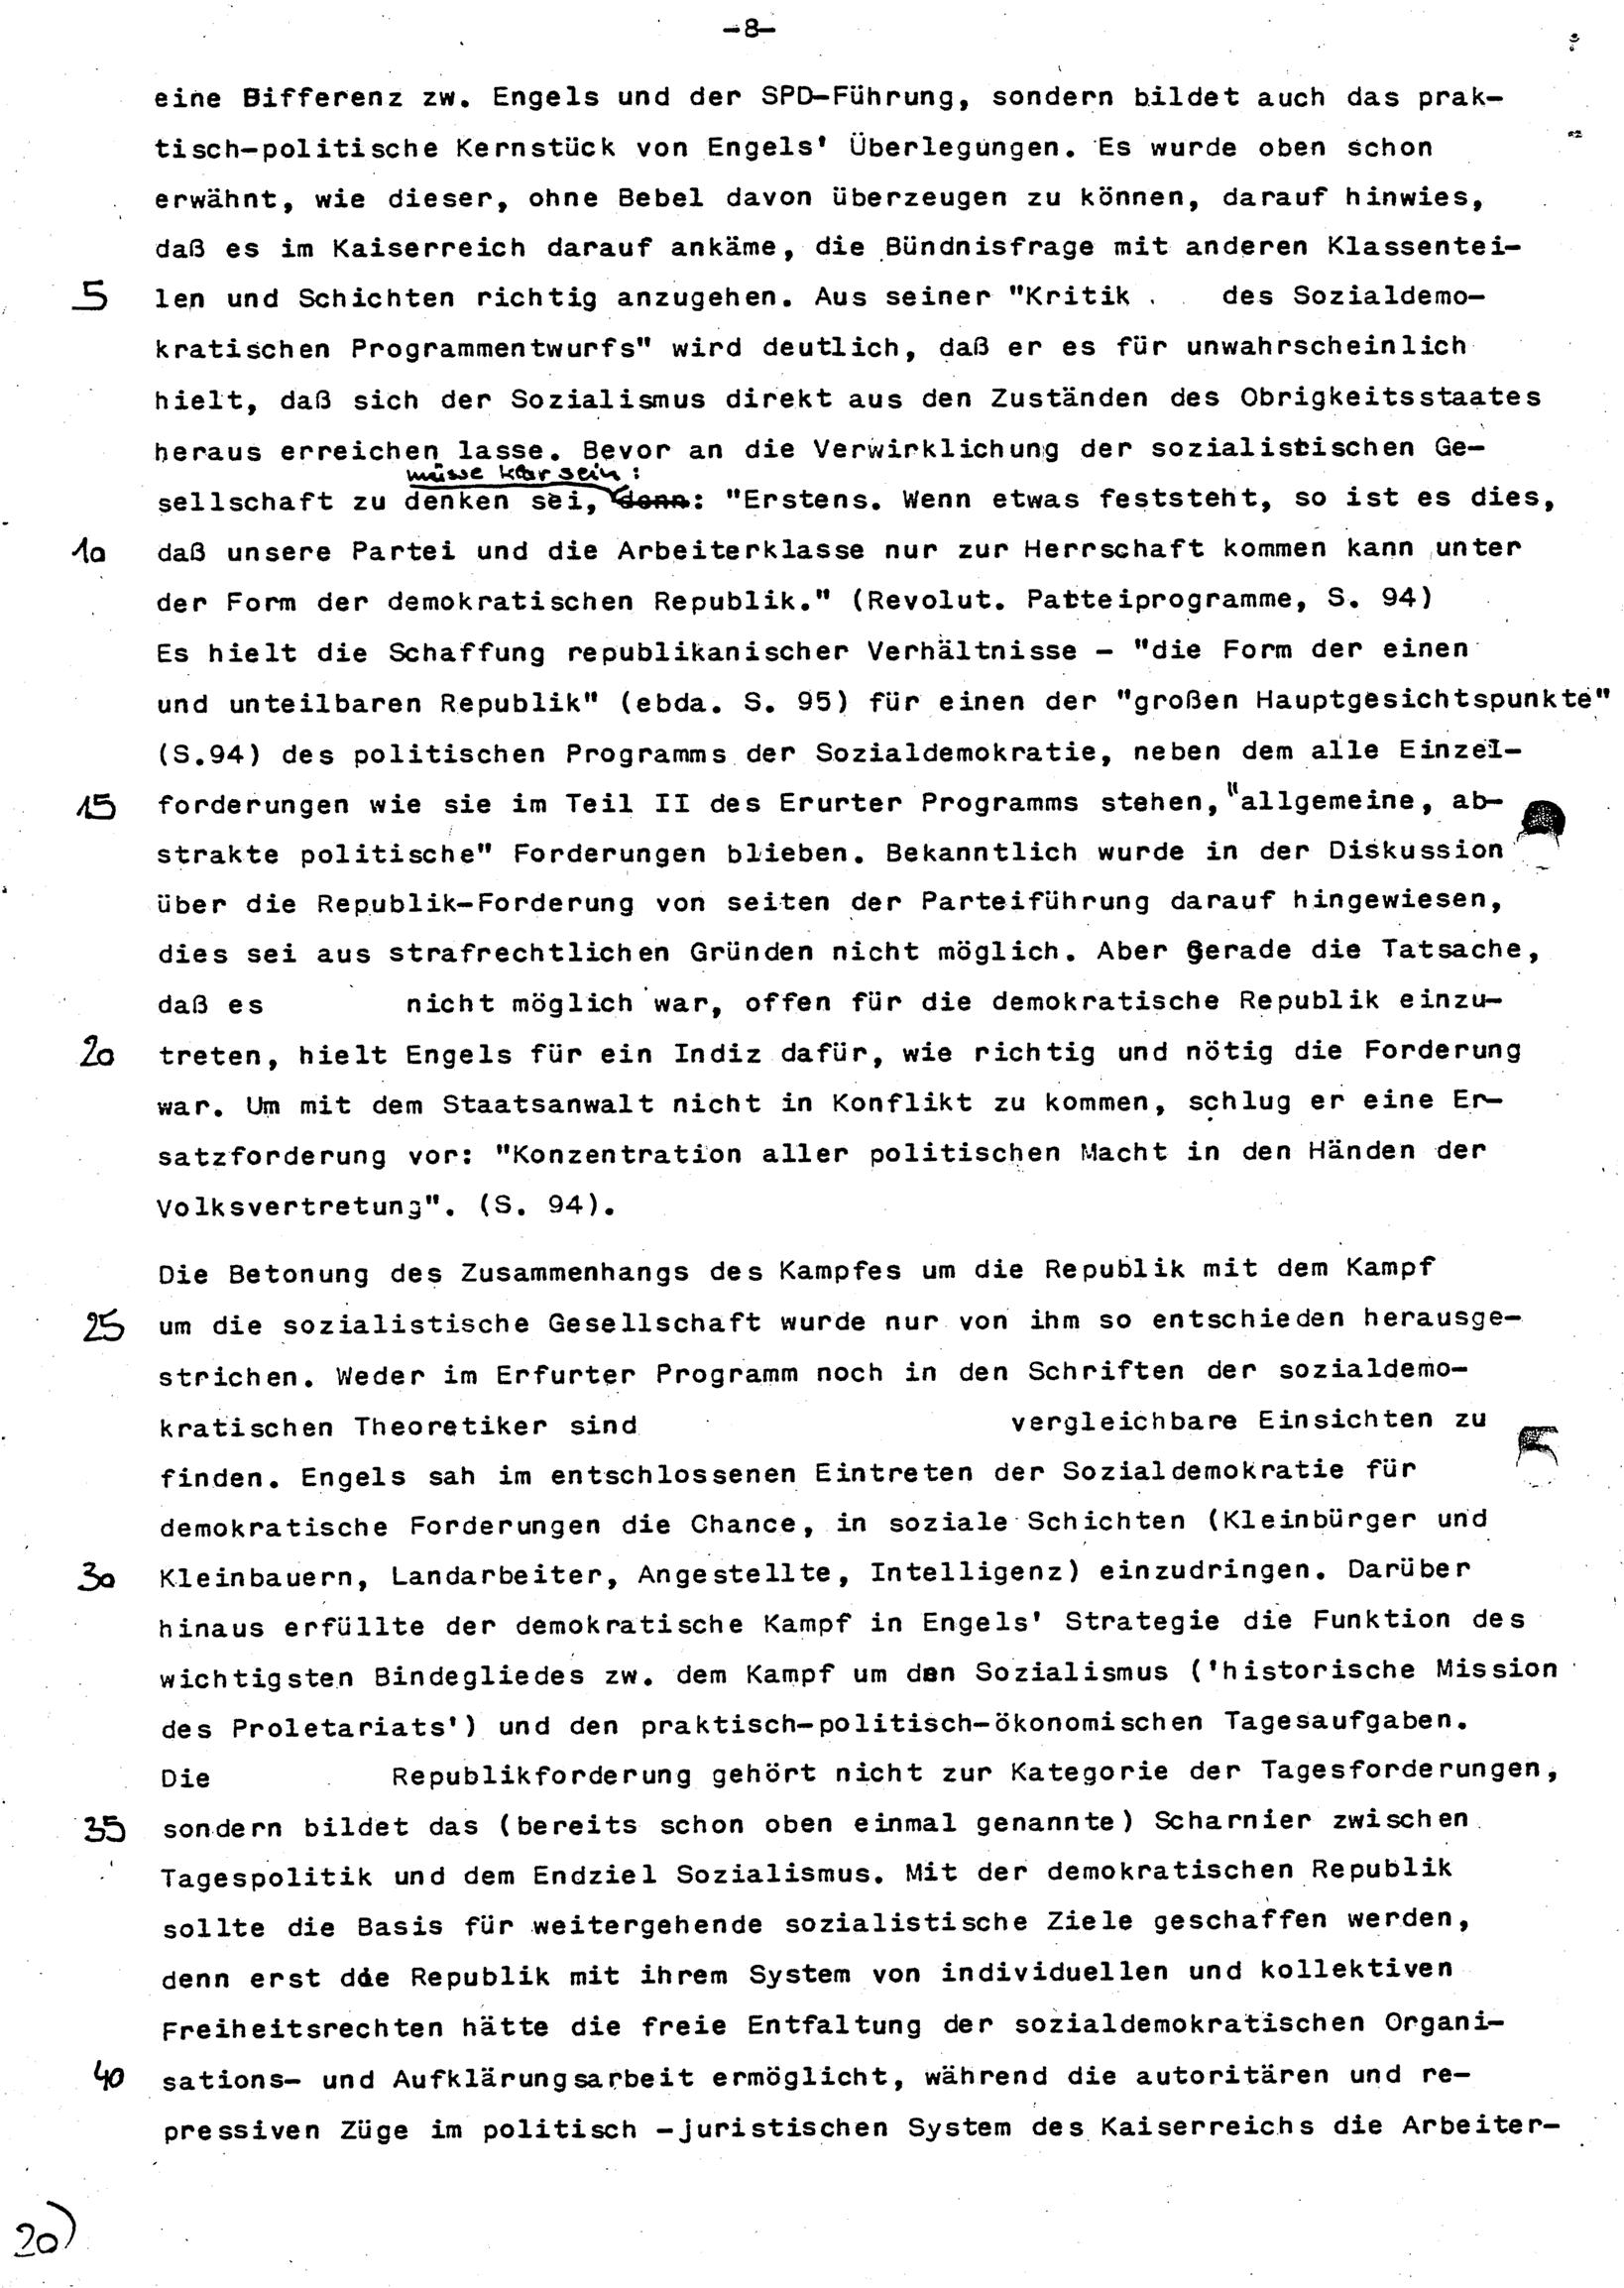 Ulm_KGU_Arbeitsheft_19830425_015_023